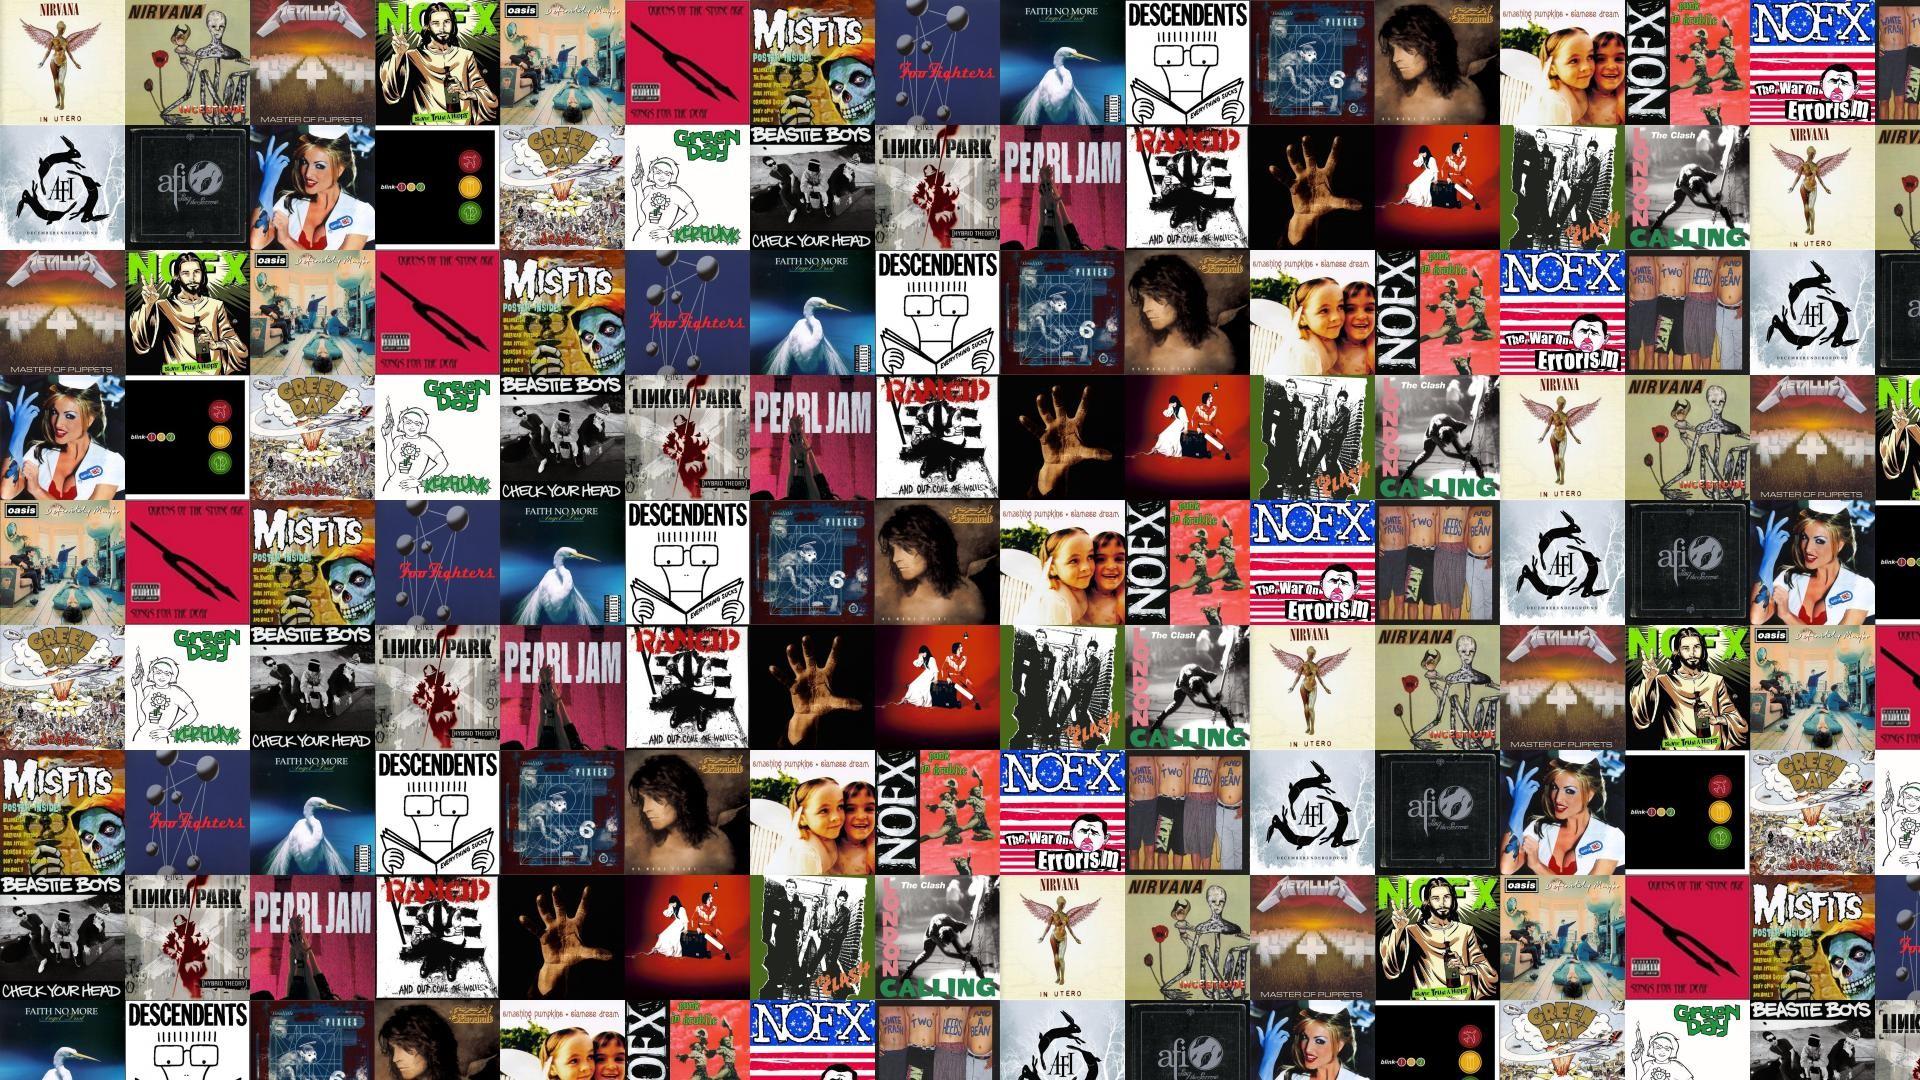 Nirvana In Utero Incesticide Metallica Master Of Puppets Wallpaper Â« Tiled  Desktop Wallpaper